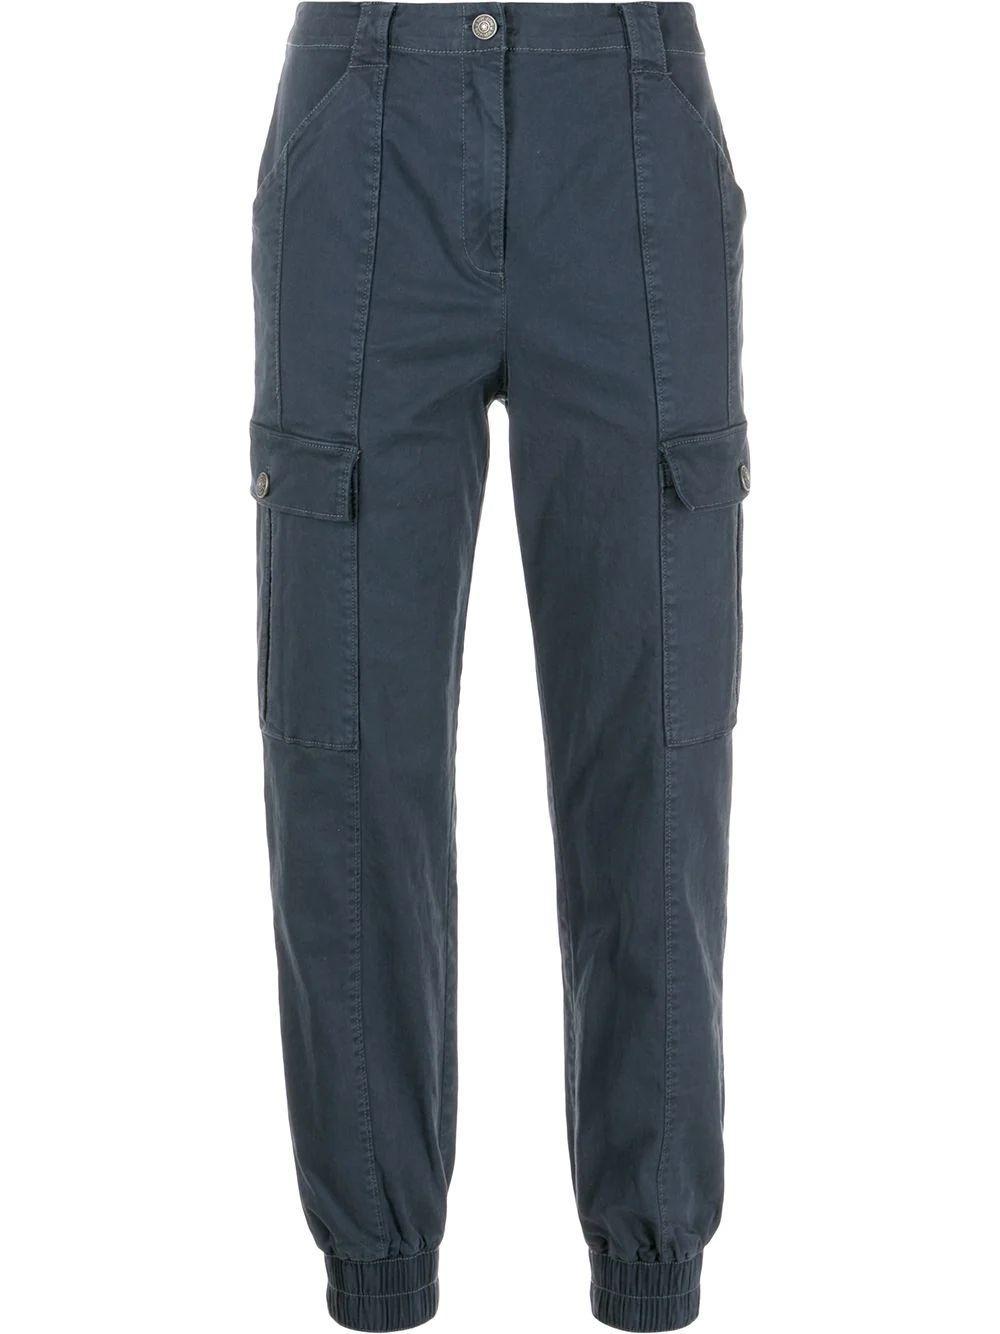 Kelly Cargo Pant Item # ZP4632574Z-S21